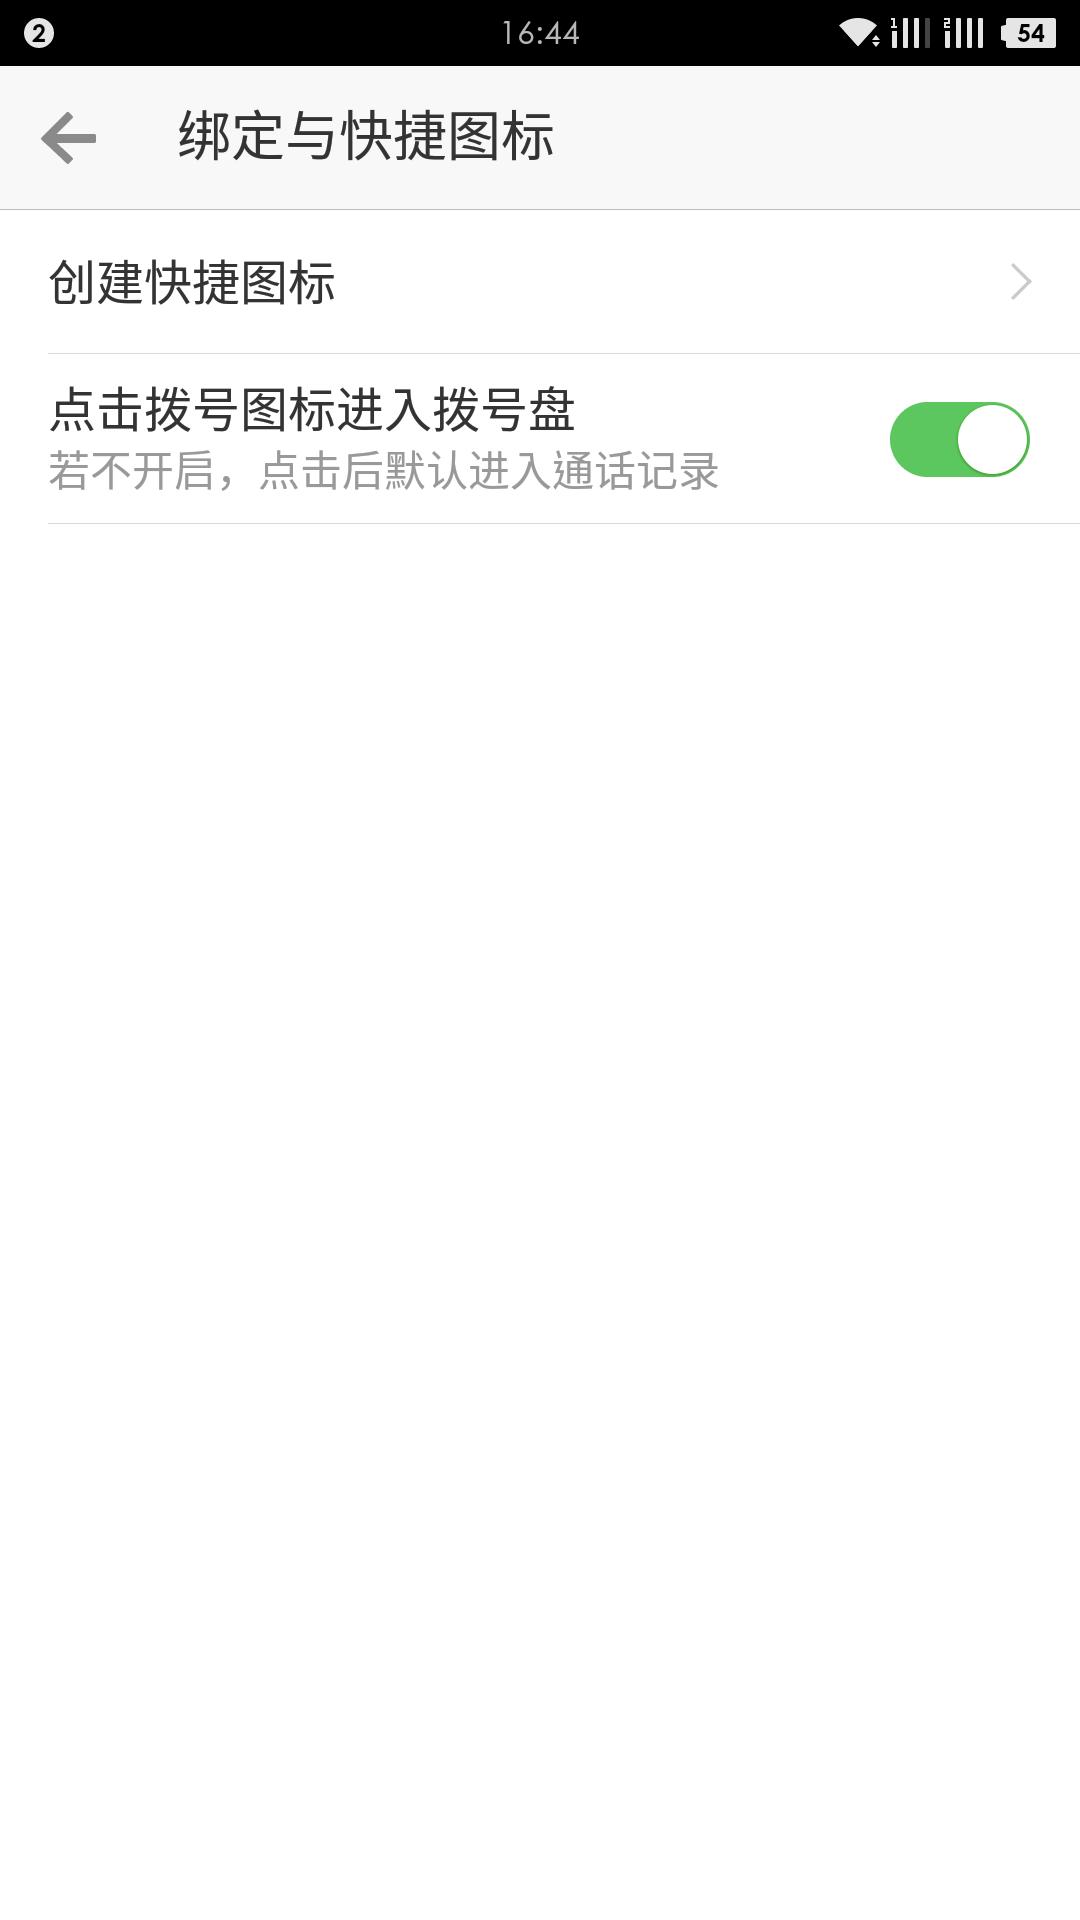 Screenshot_2015-11-22-16-44-57.png